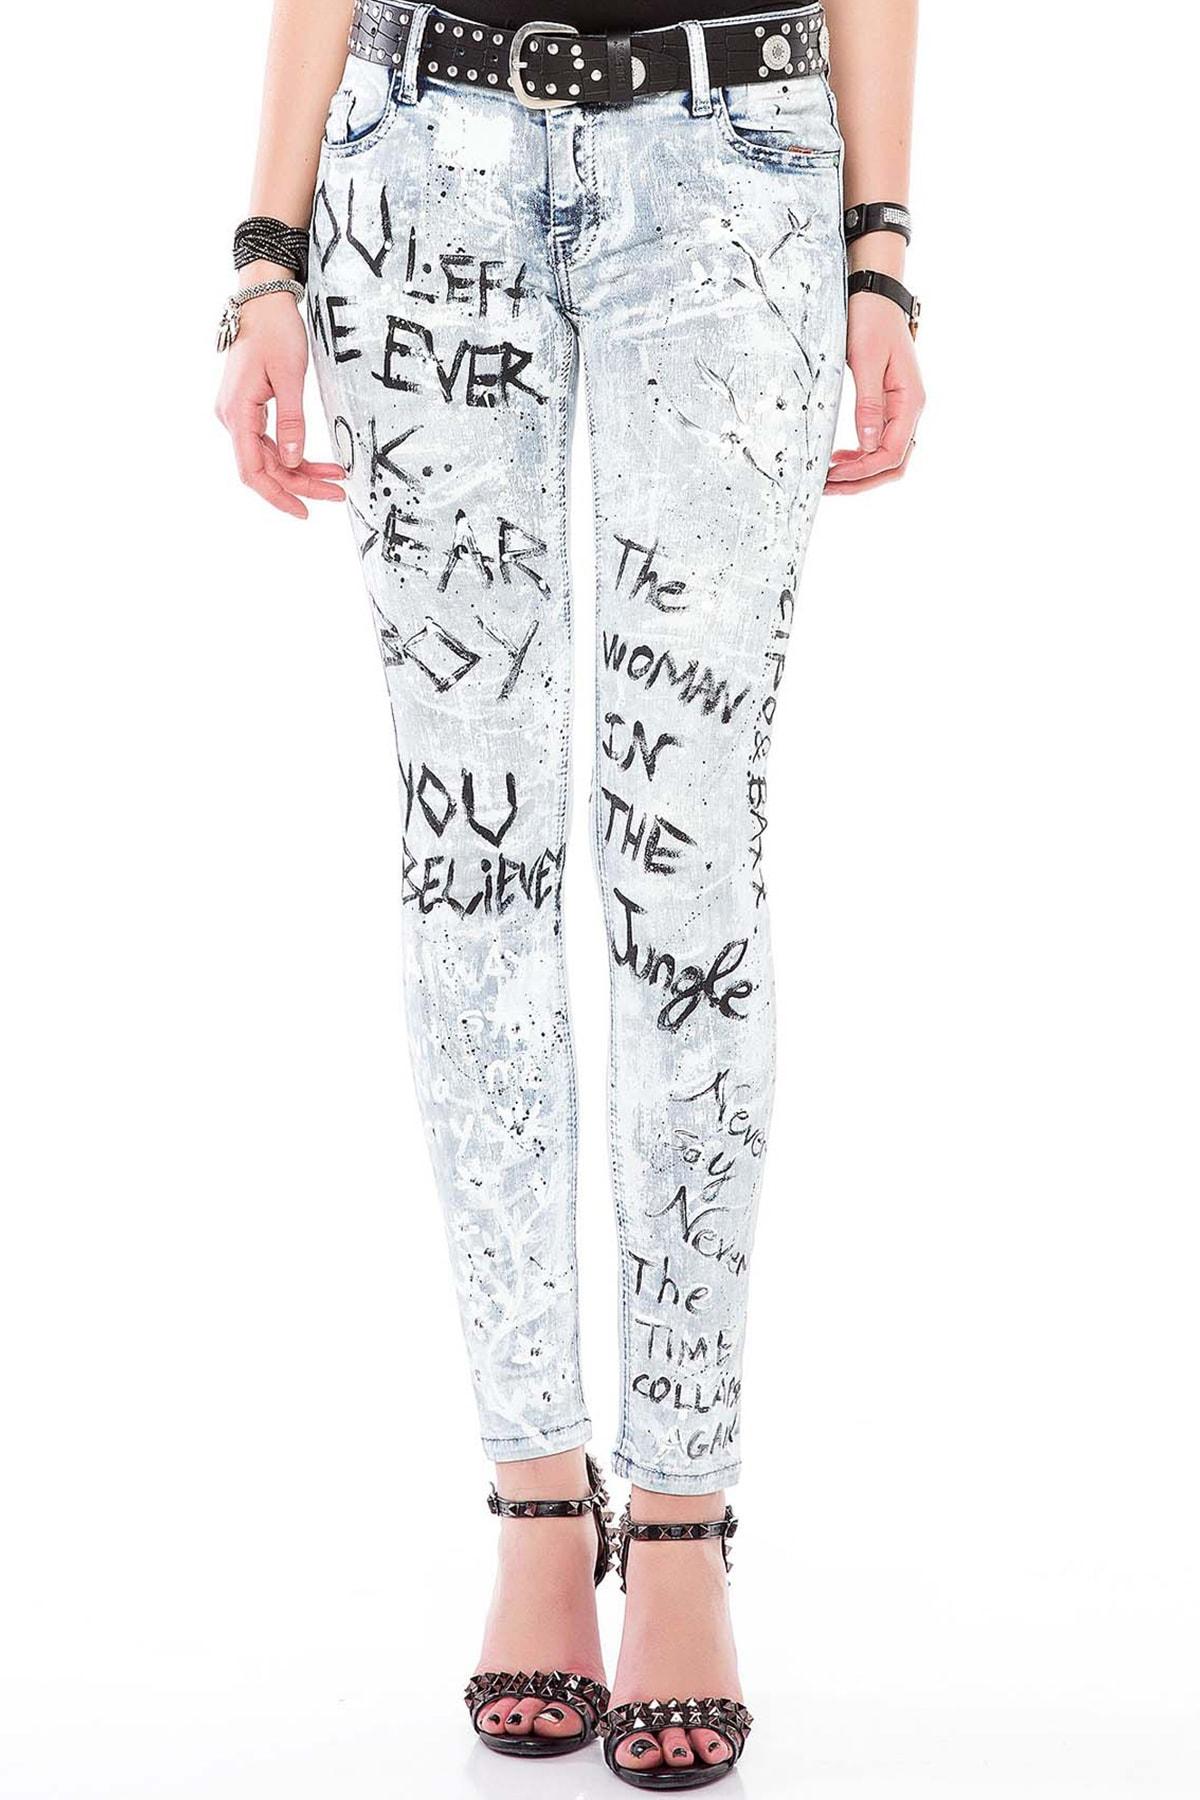 Cipo&Baxx WD370 Boyalı Baskılı Buz Mavi Slim Fit Bayan Jeans Kot 2